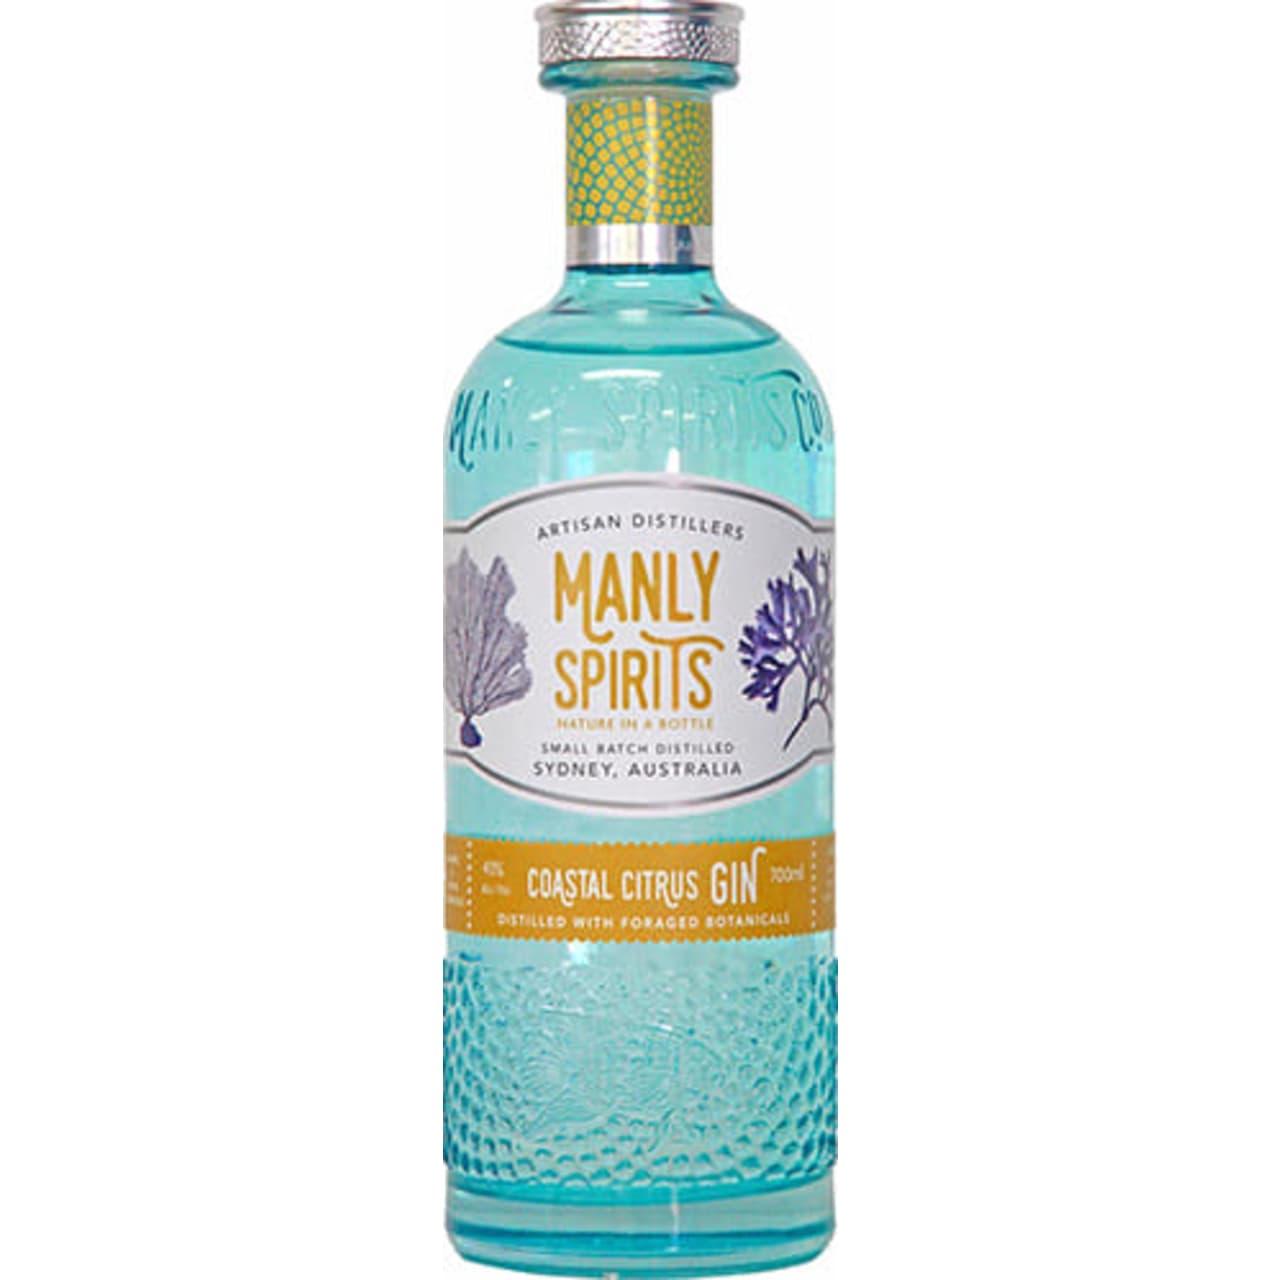 Product Image - Manly Spirits Co. Coastal Citrus Gin